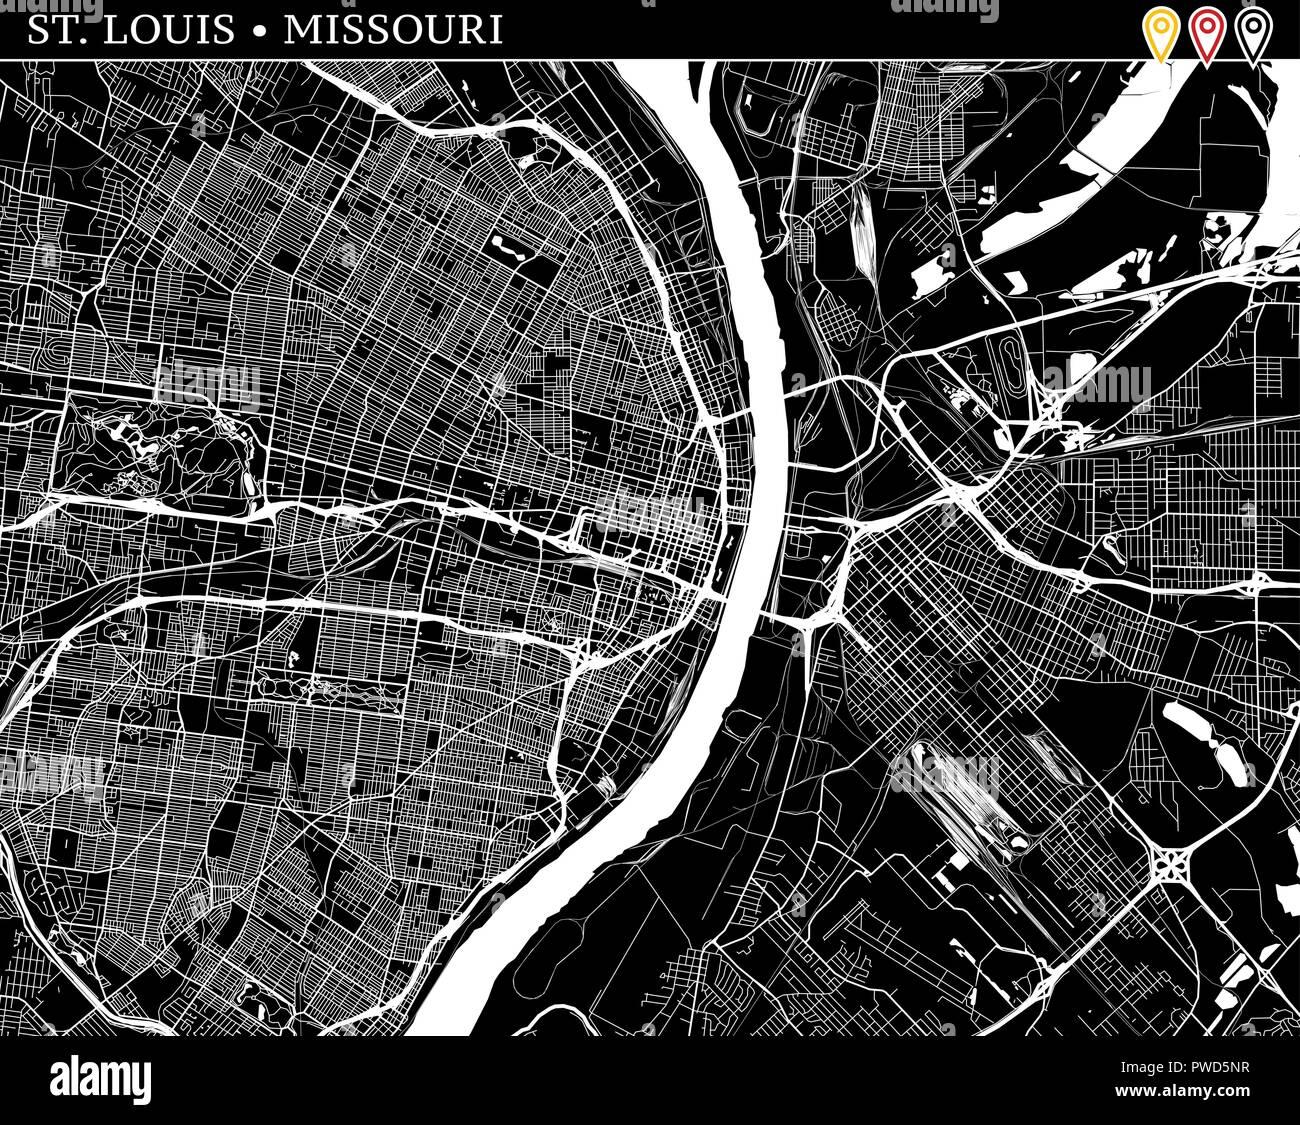 Simple map of St. Louis, Missouri, USA. Black and white ... on liberty missouri usa map, nashville tennessee usa map, wichita kansas usa map, albany new york usa map, st. louis map, minneapolis minnesota usa map, providence rhode island usa map, birmingham alabama usa map, boston massachusetts usa map, tacoma washington usa map, springfield missouri usa map, buffalo new york usa map, franklin missouri usa map, lebanon missouri usa map, state of missouri location map, atlanta georgia usa map, omaha nebraska usa map, independence missouri usa map, san diego california usa map, des moines iowa usa map,